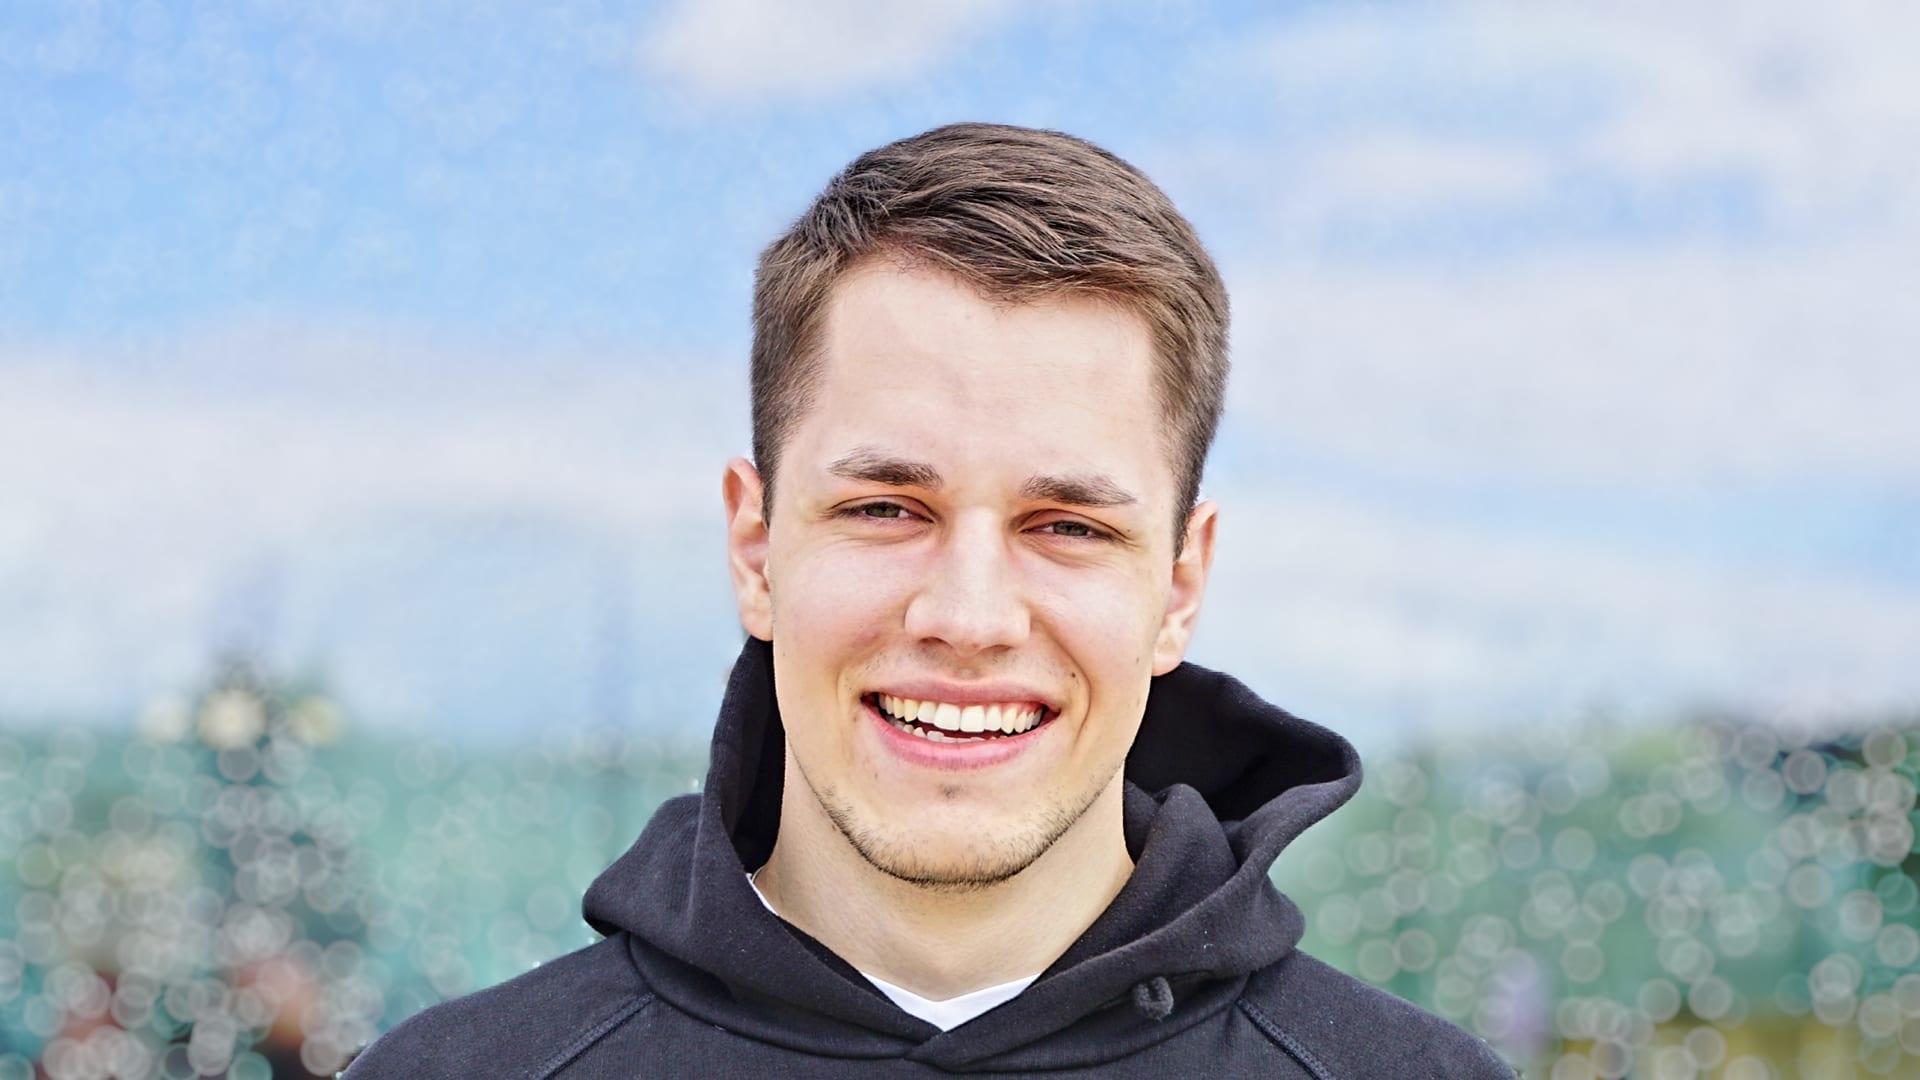 Alexander_Spelman_EntrepreneursofFinland_bg